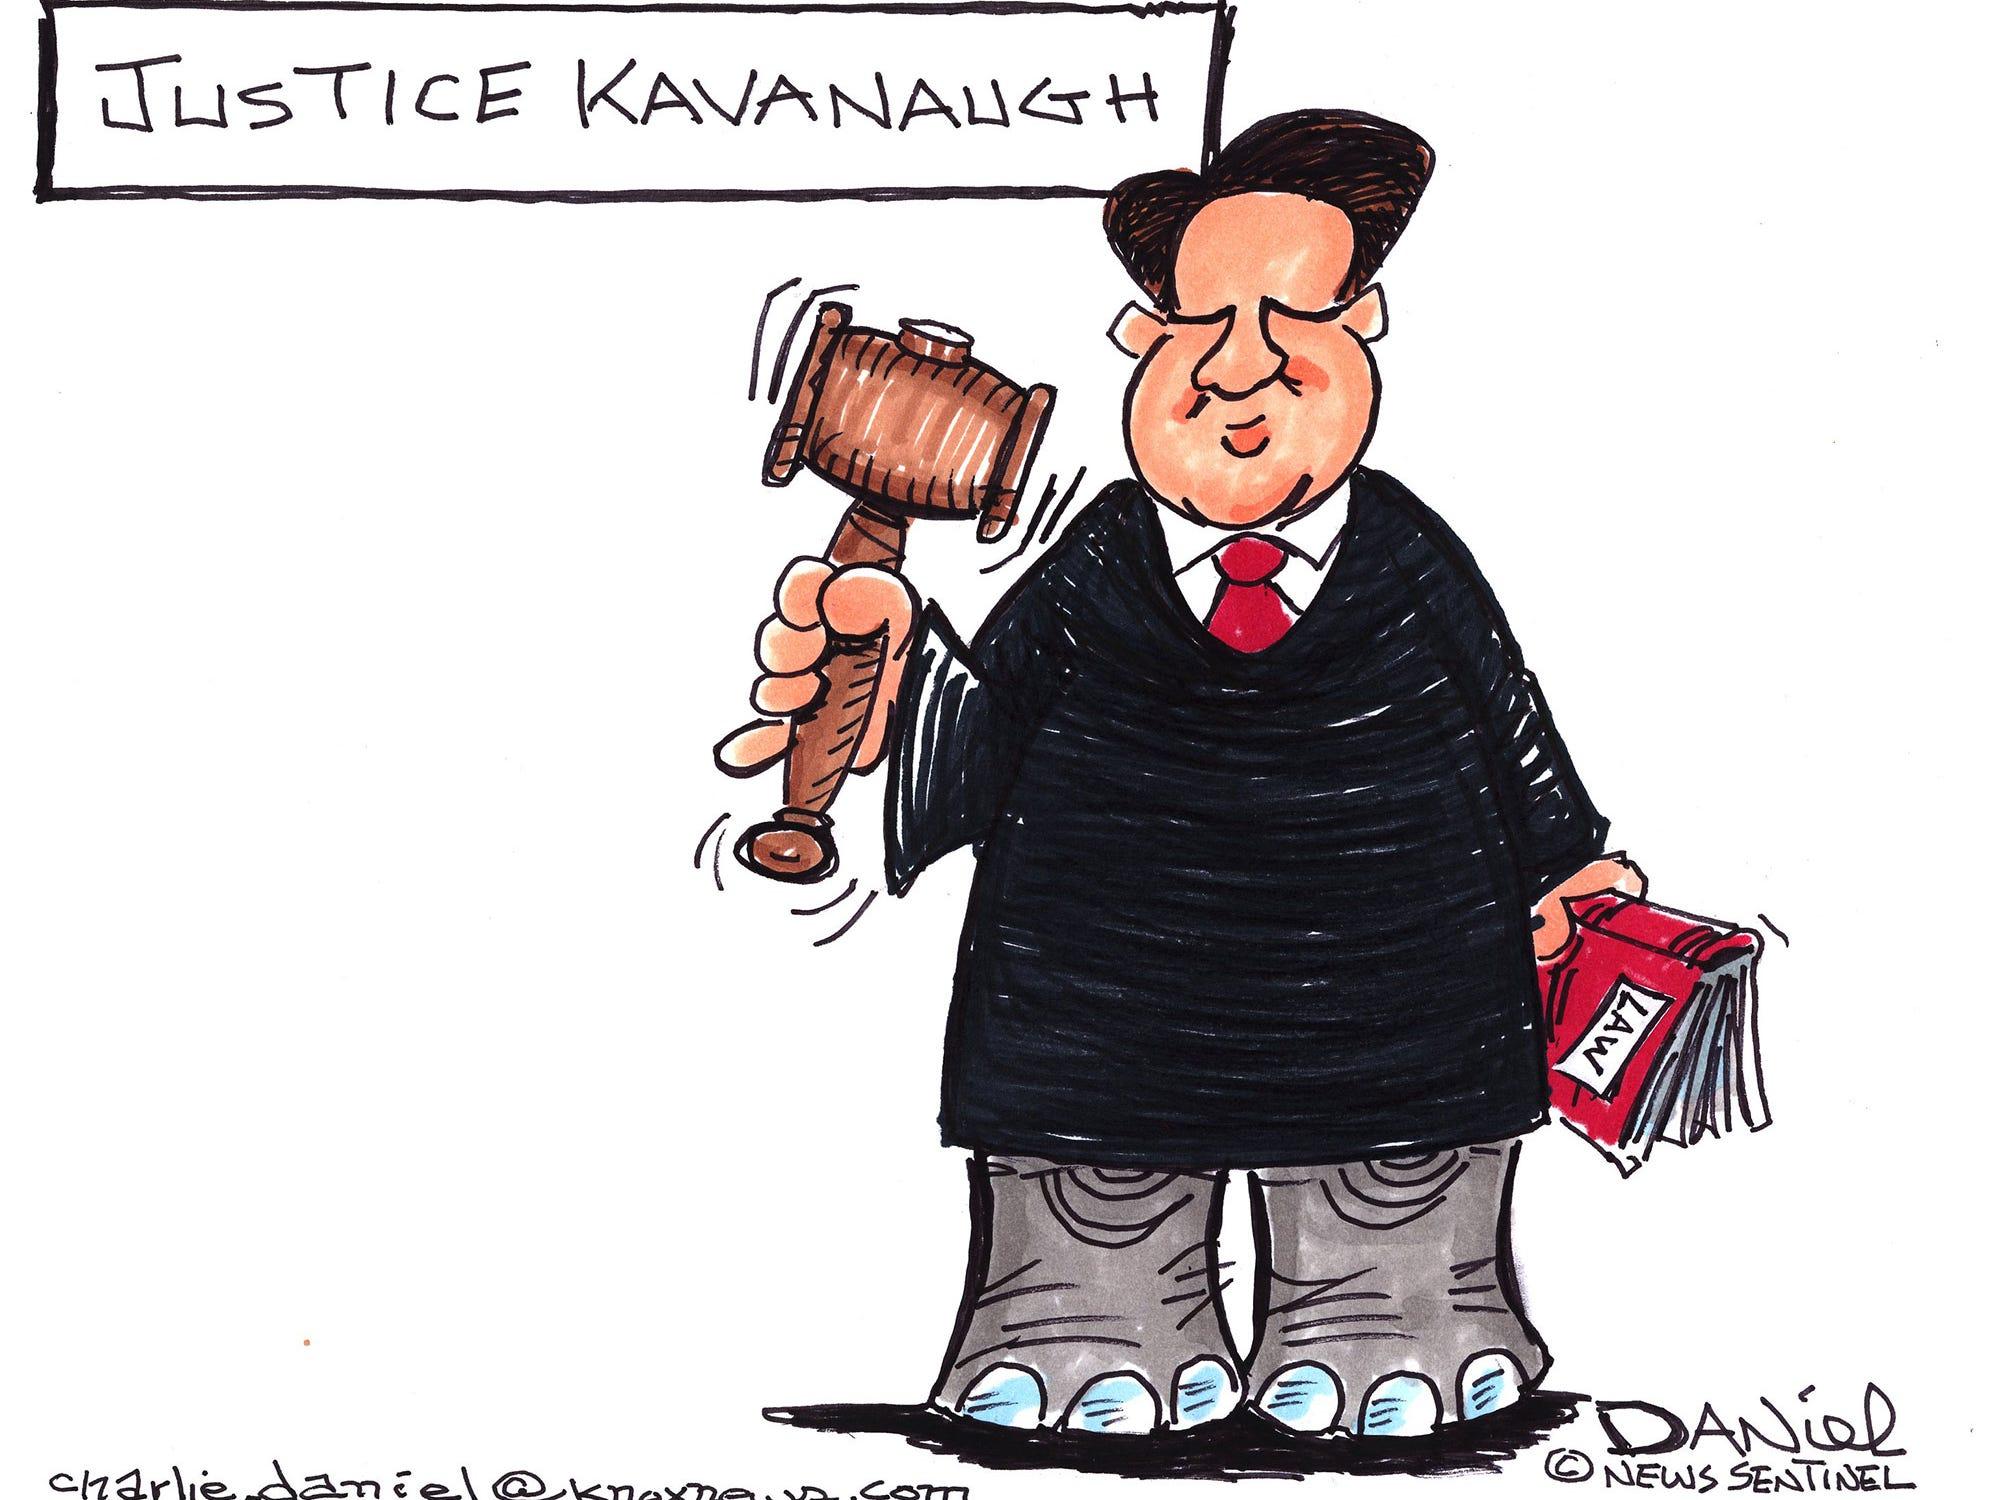 Charlie Daniel editorial cartoon for Wednesday, Oct. 10, 2018.